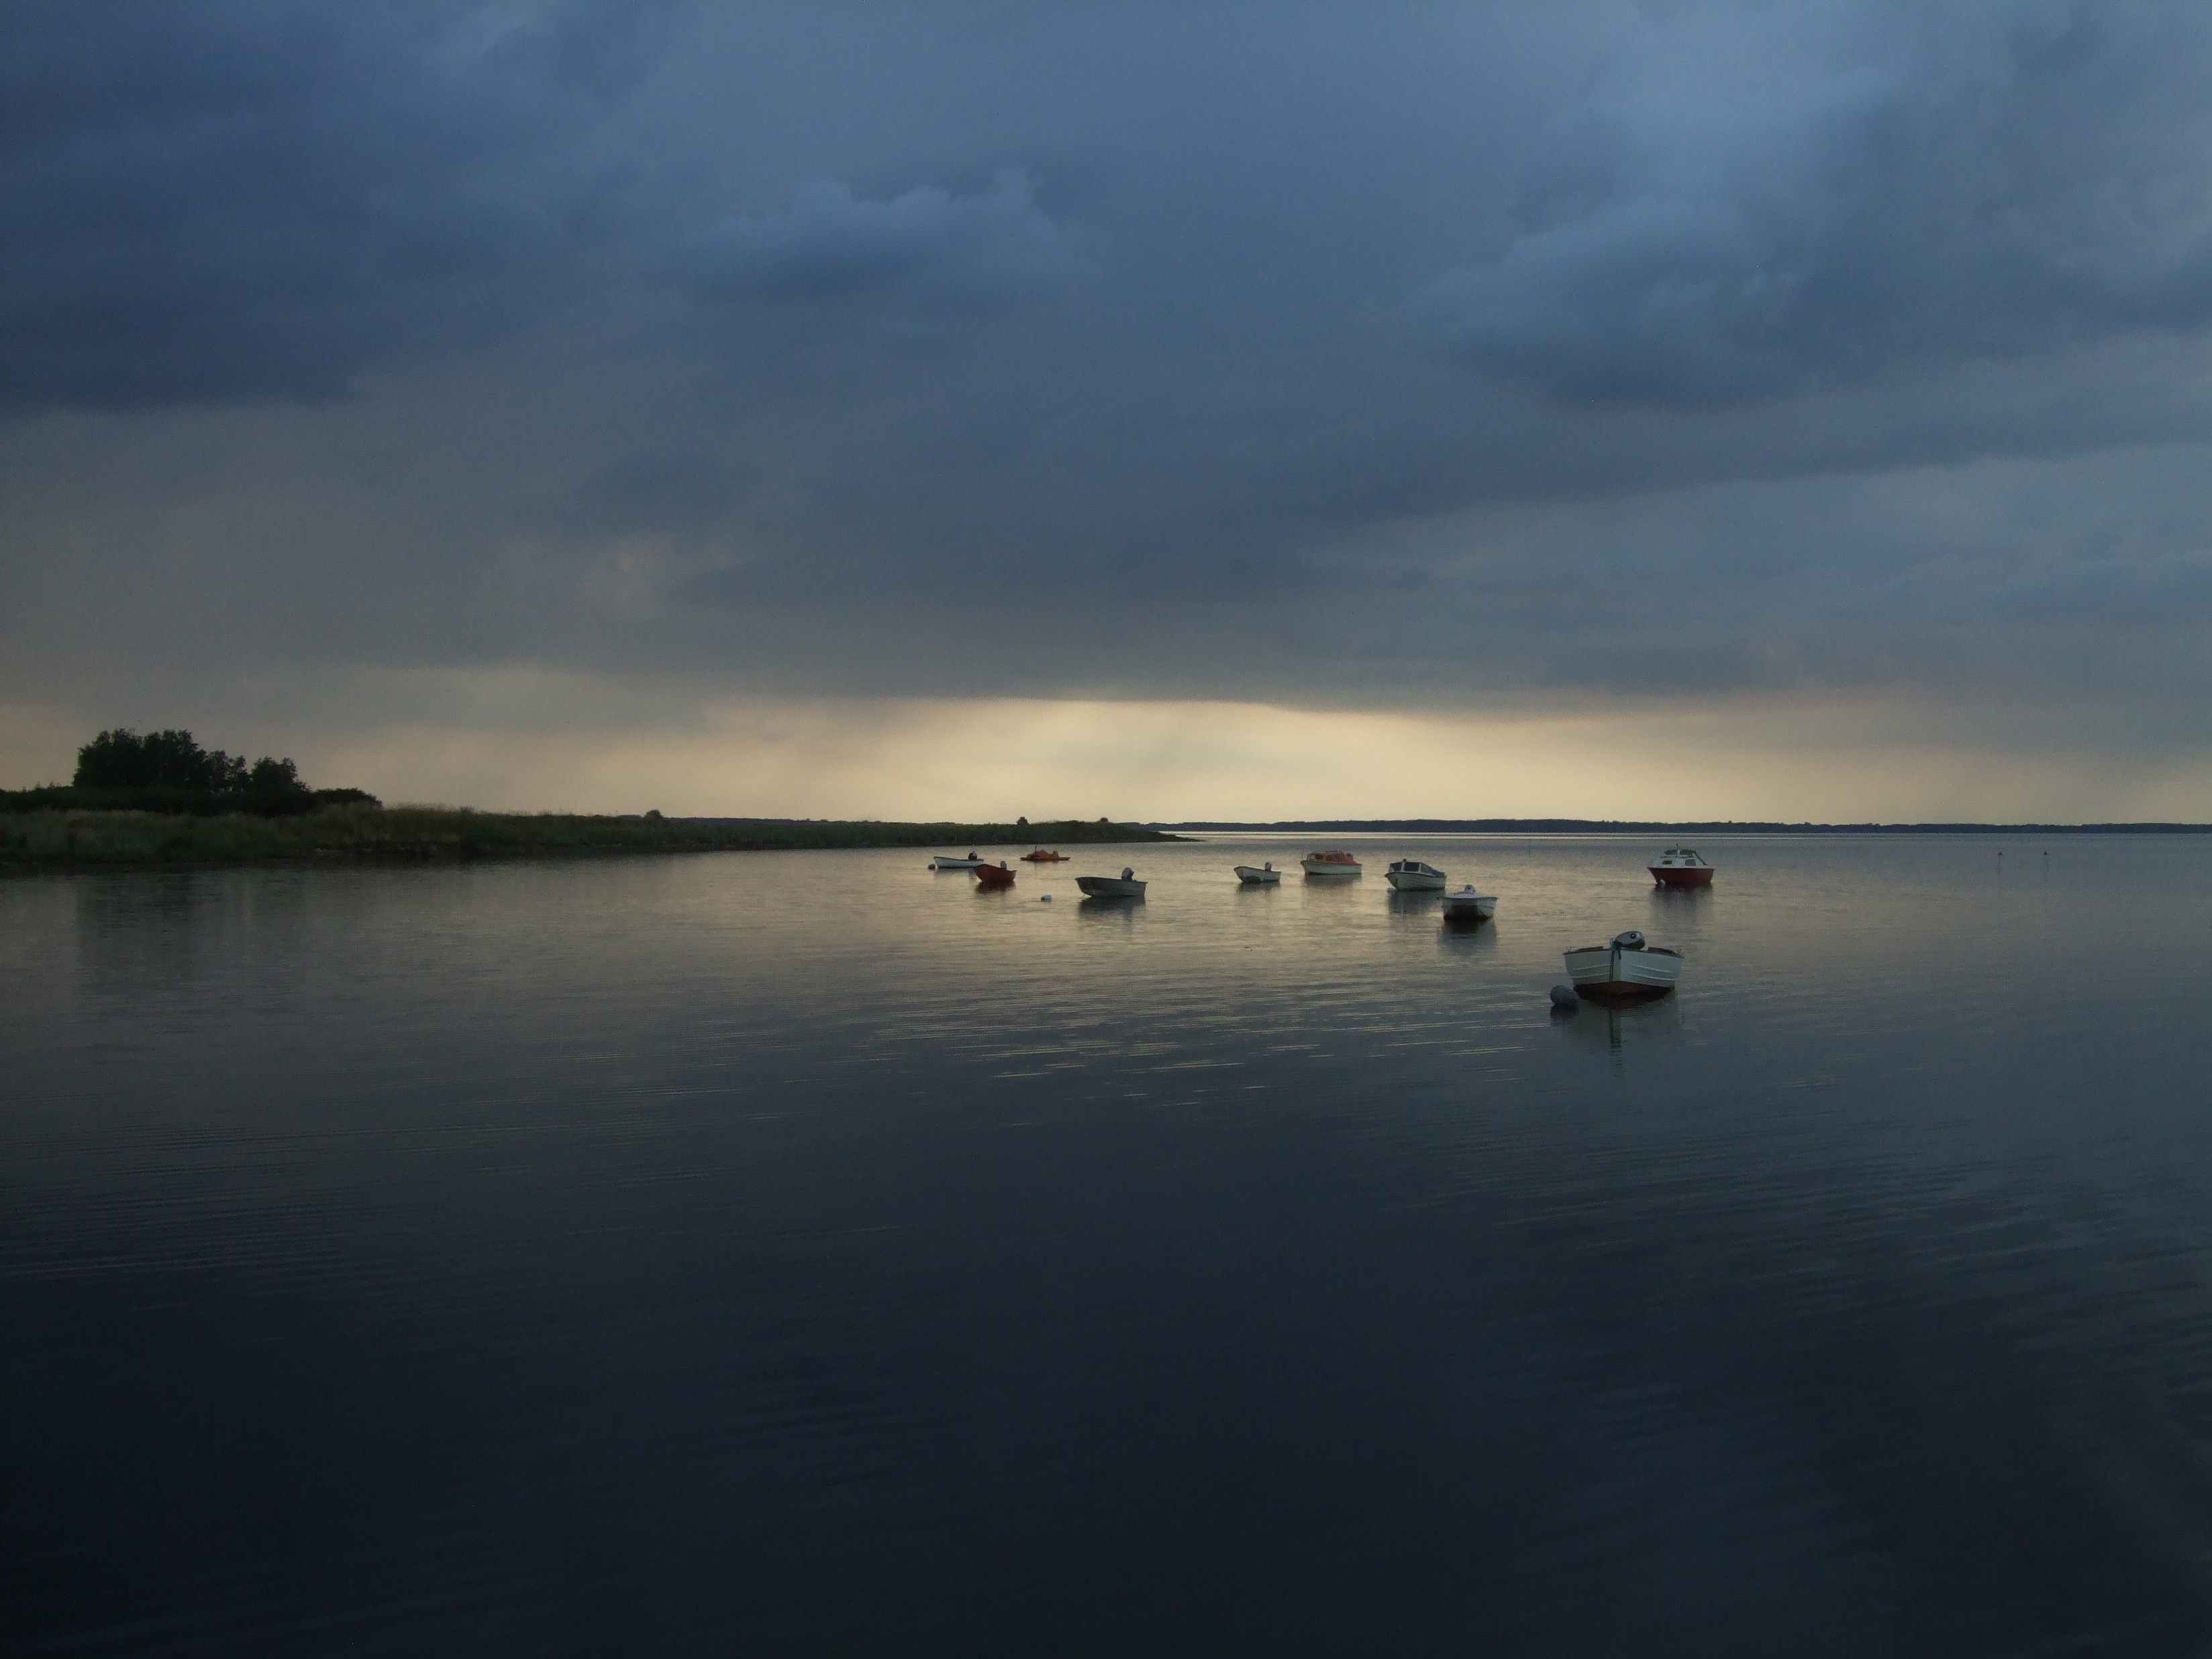 eveninglight at boats